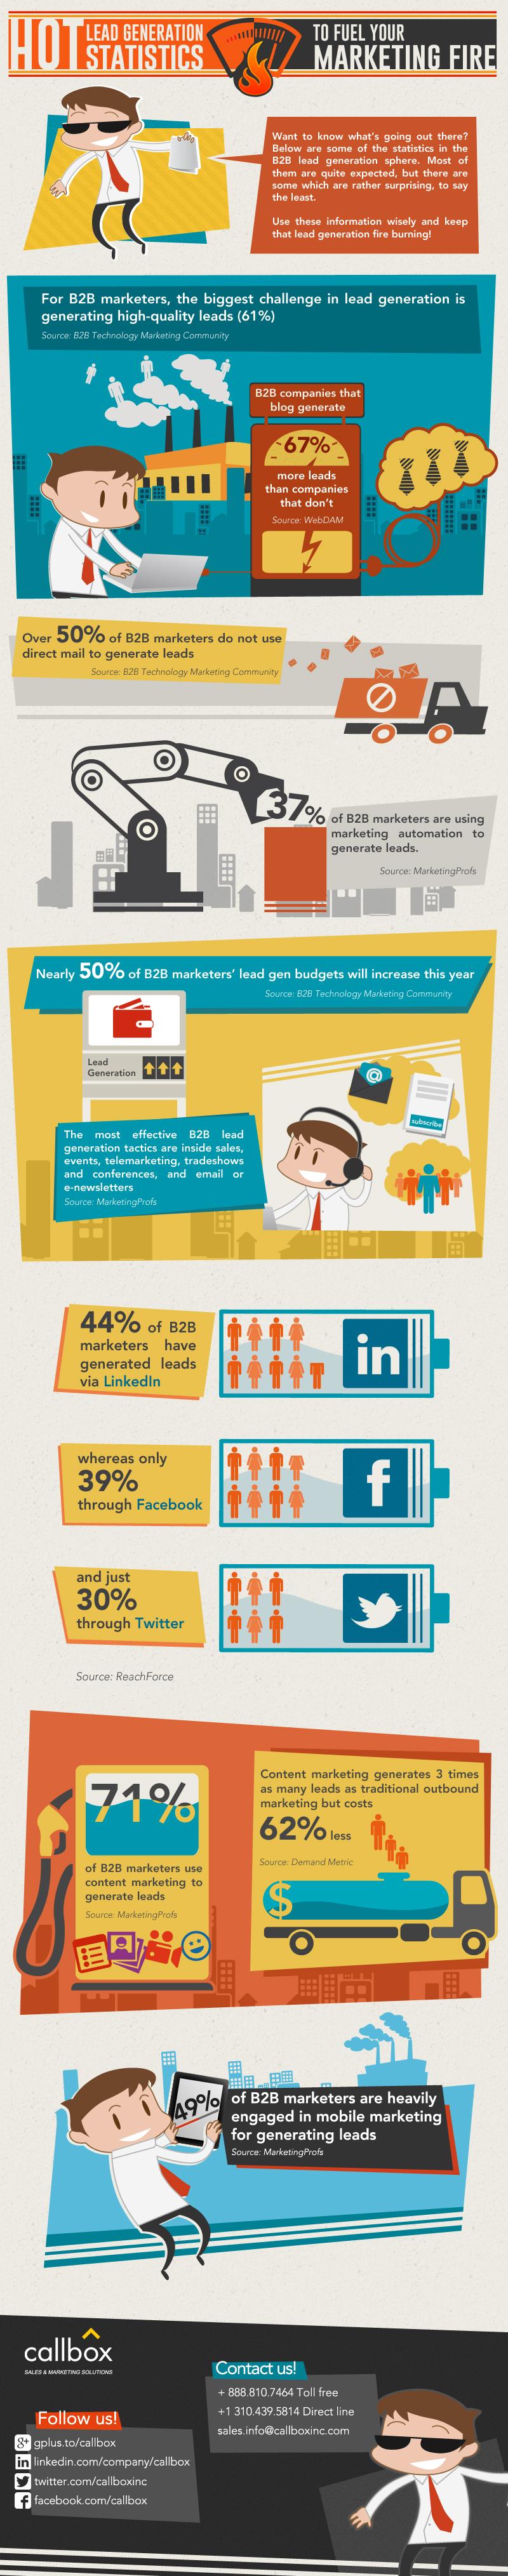 Hot B2B Lead Generation Statistics to Fuel Your Marketing Fire